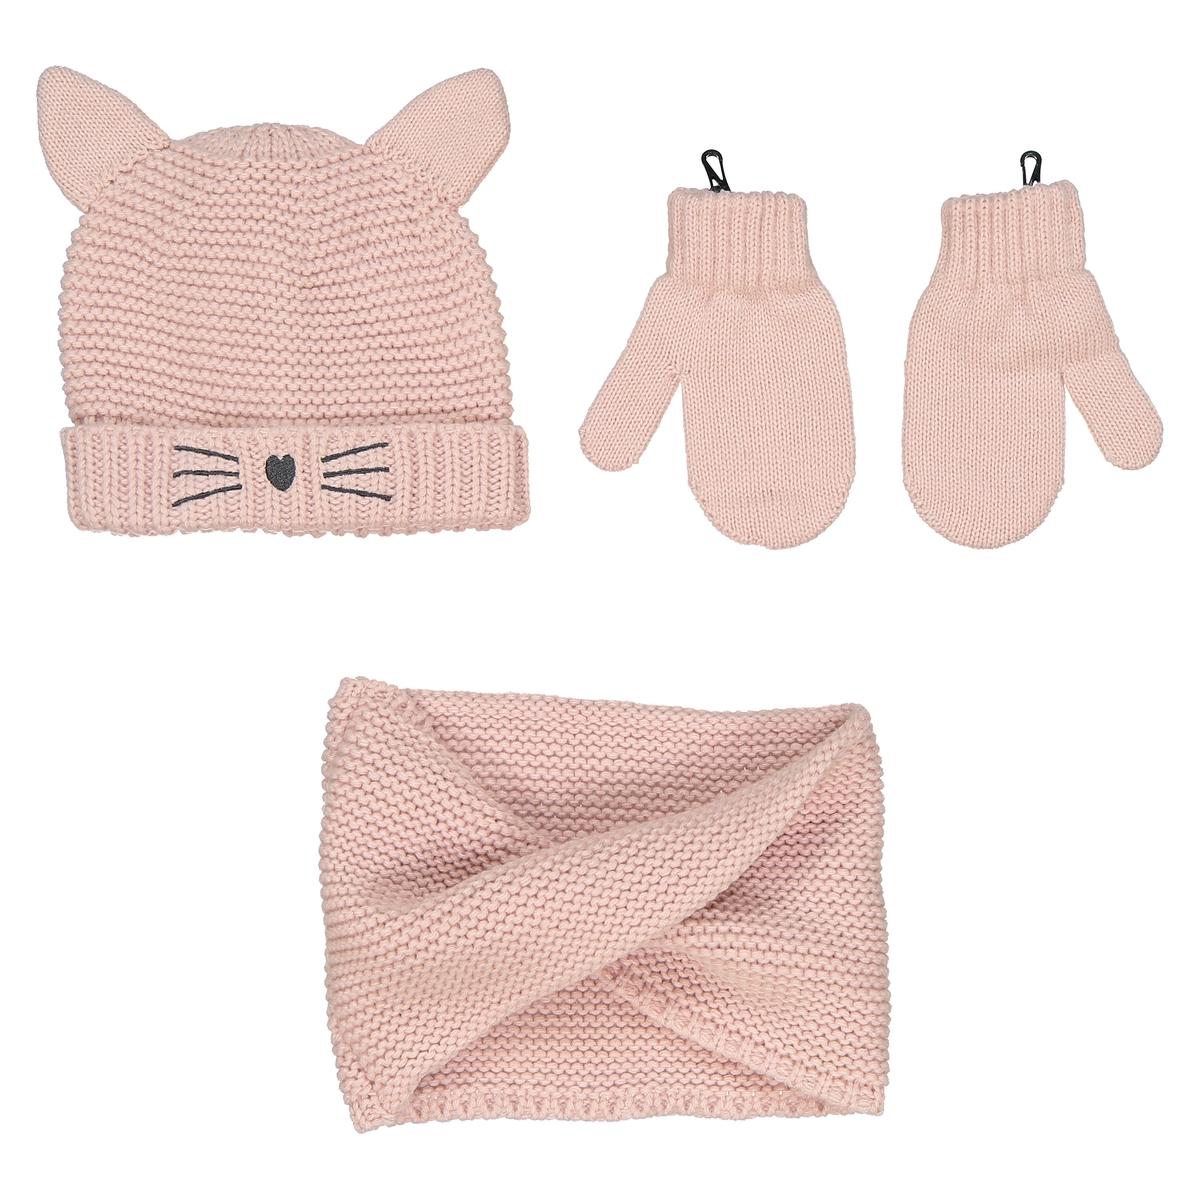 Комплект: шапка, варежки и шарф, 0 мес. - 3 года